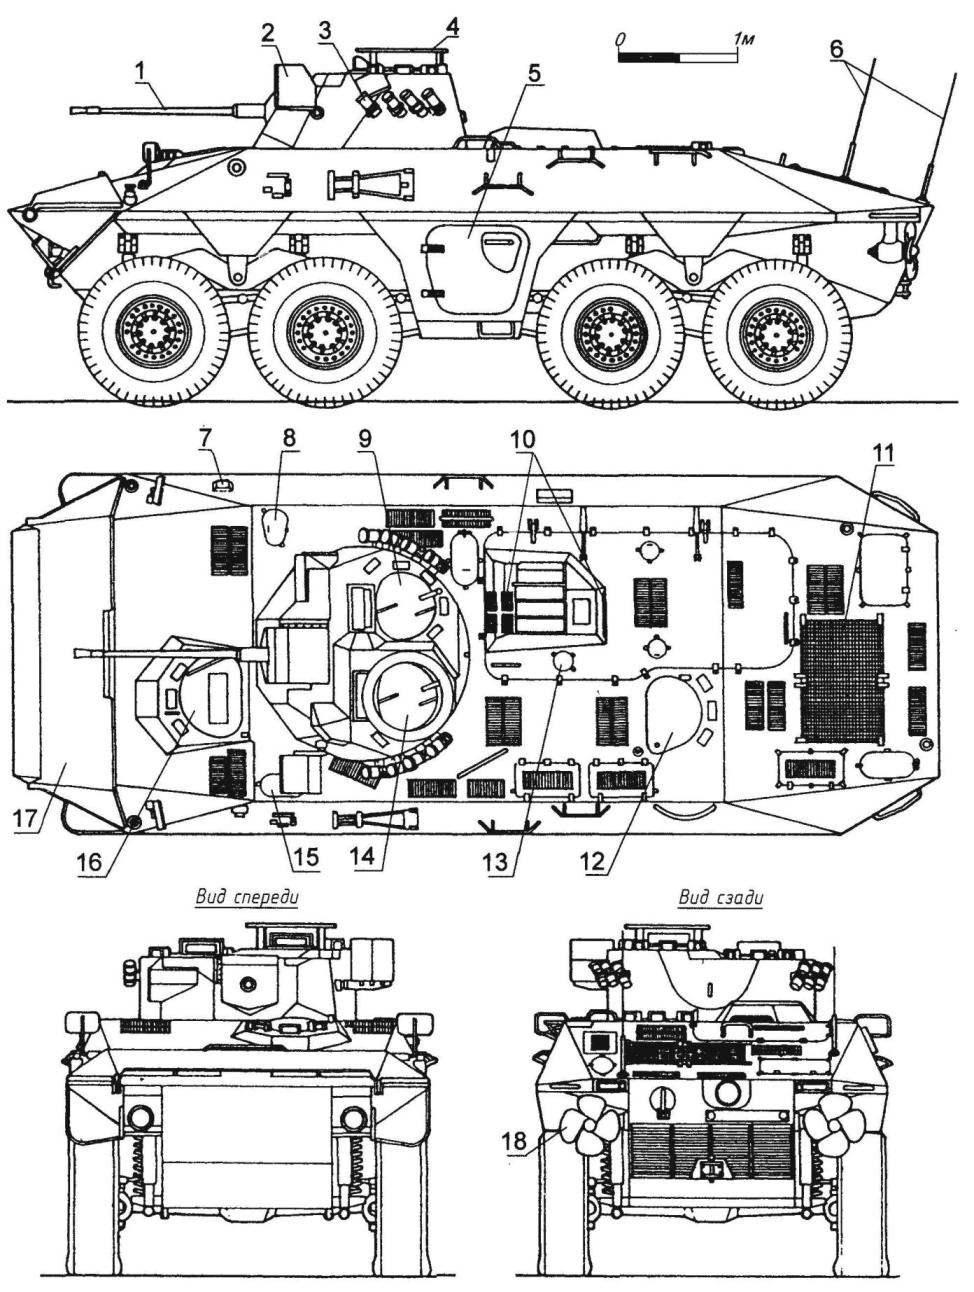 Spa Pz-2 Luchs